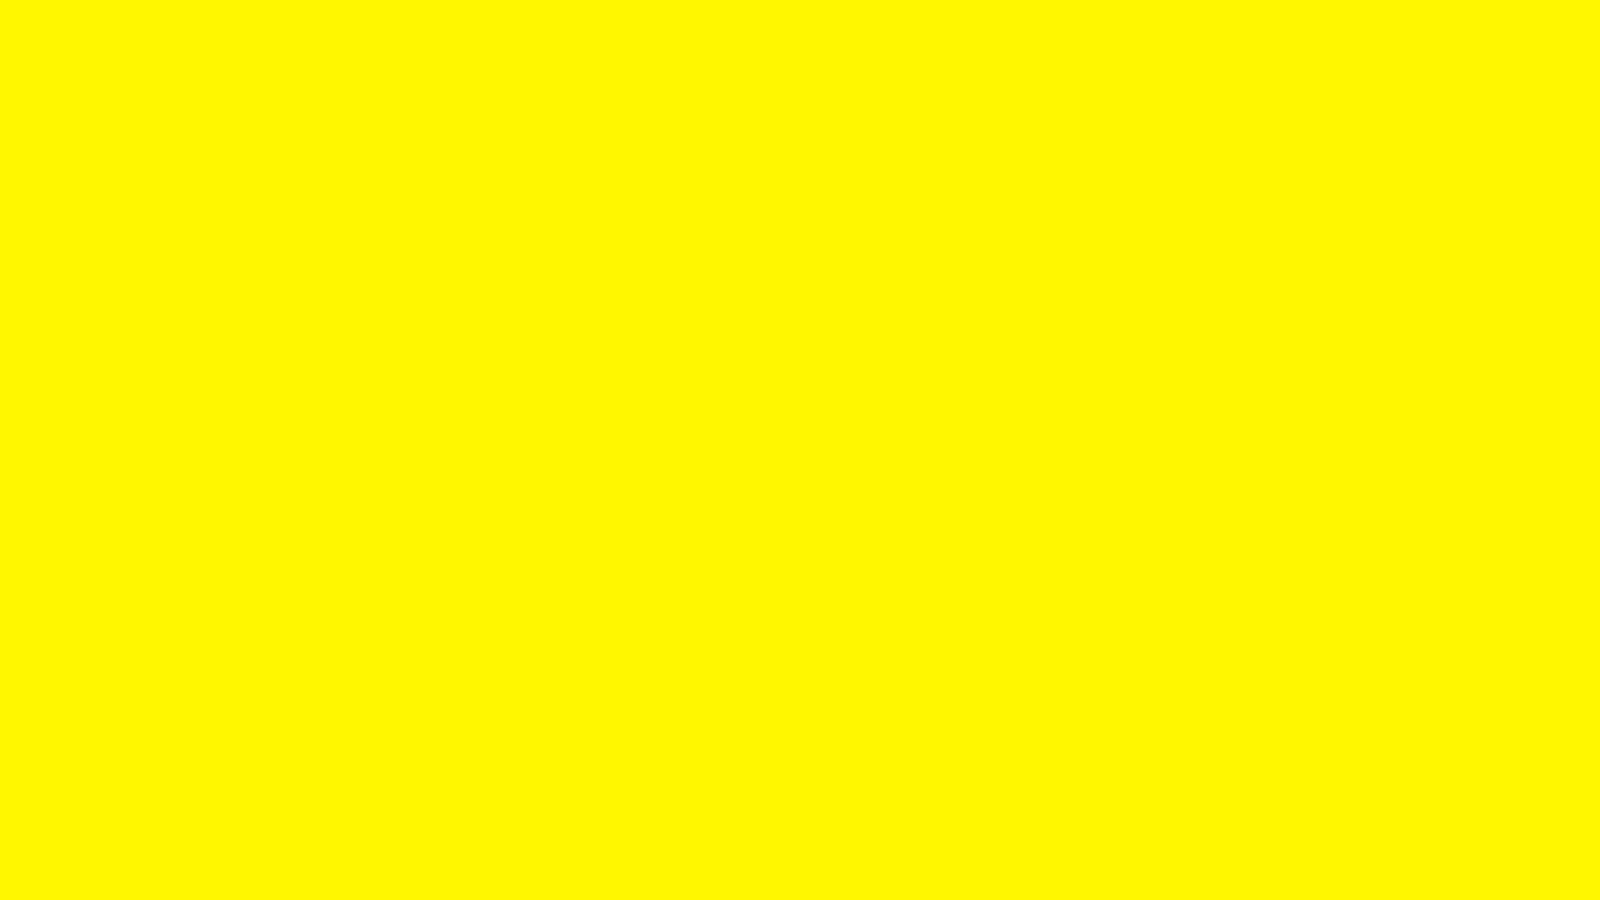 1600x900 Lemon Solid Color Background